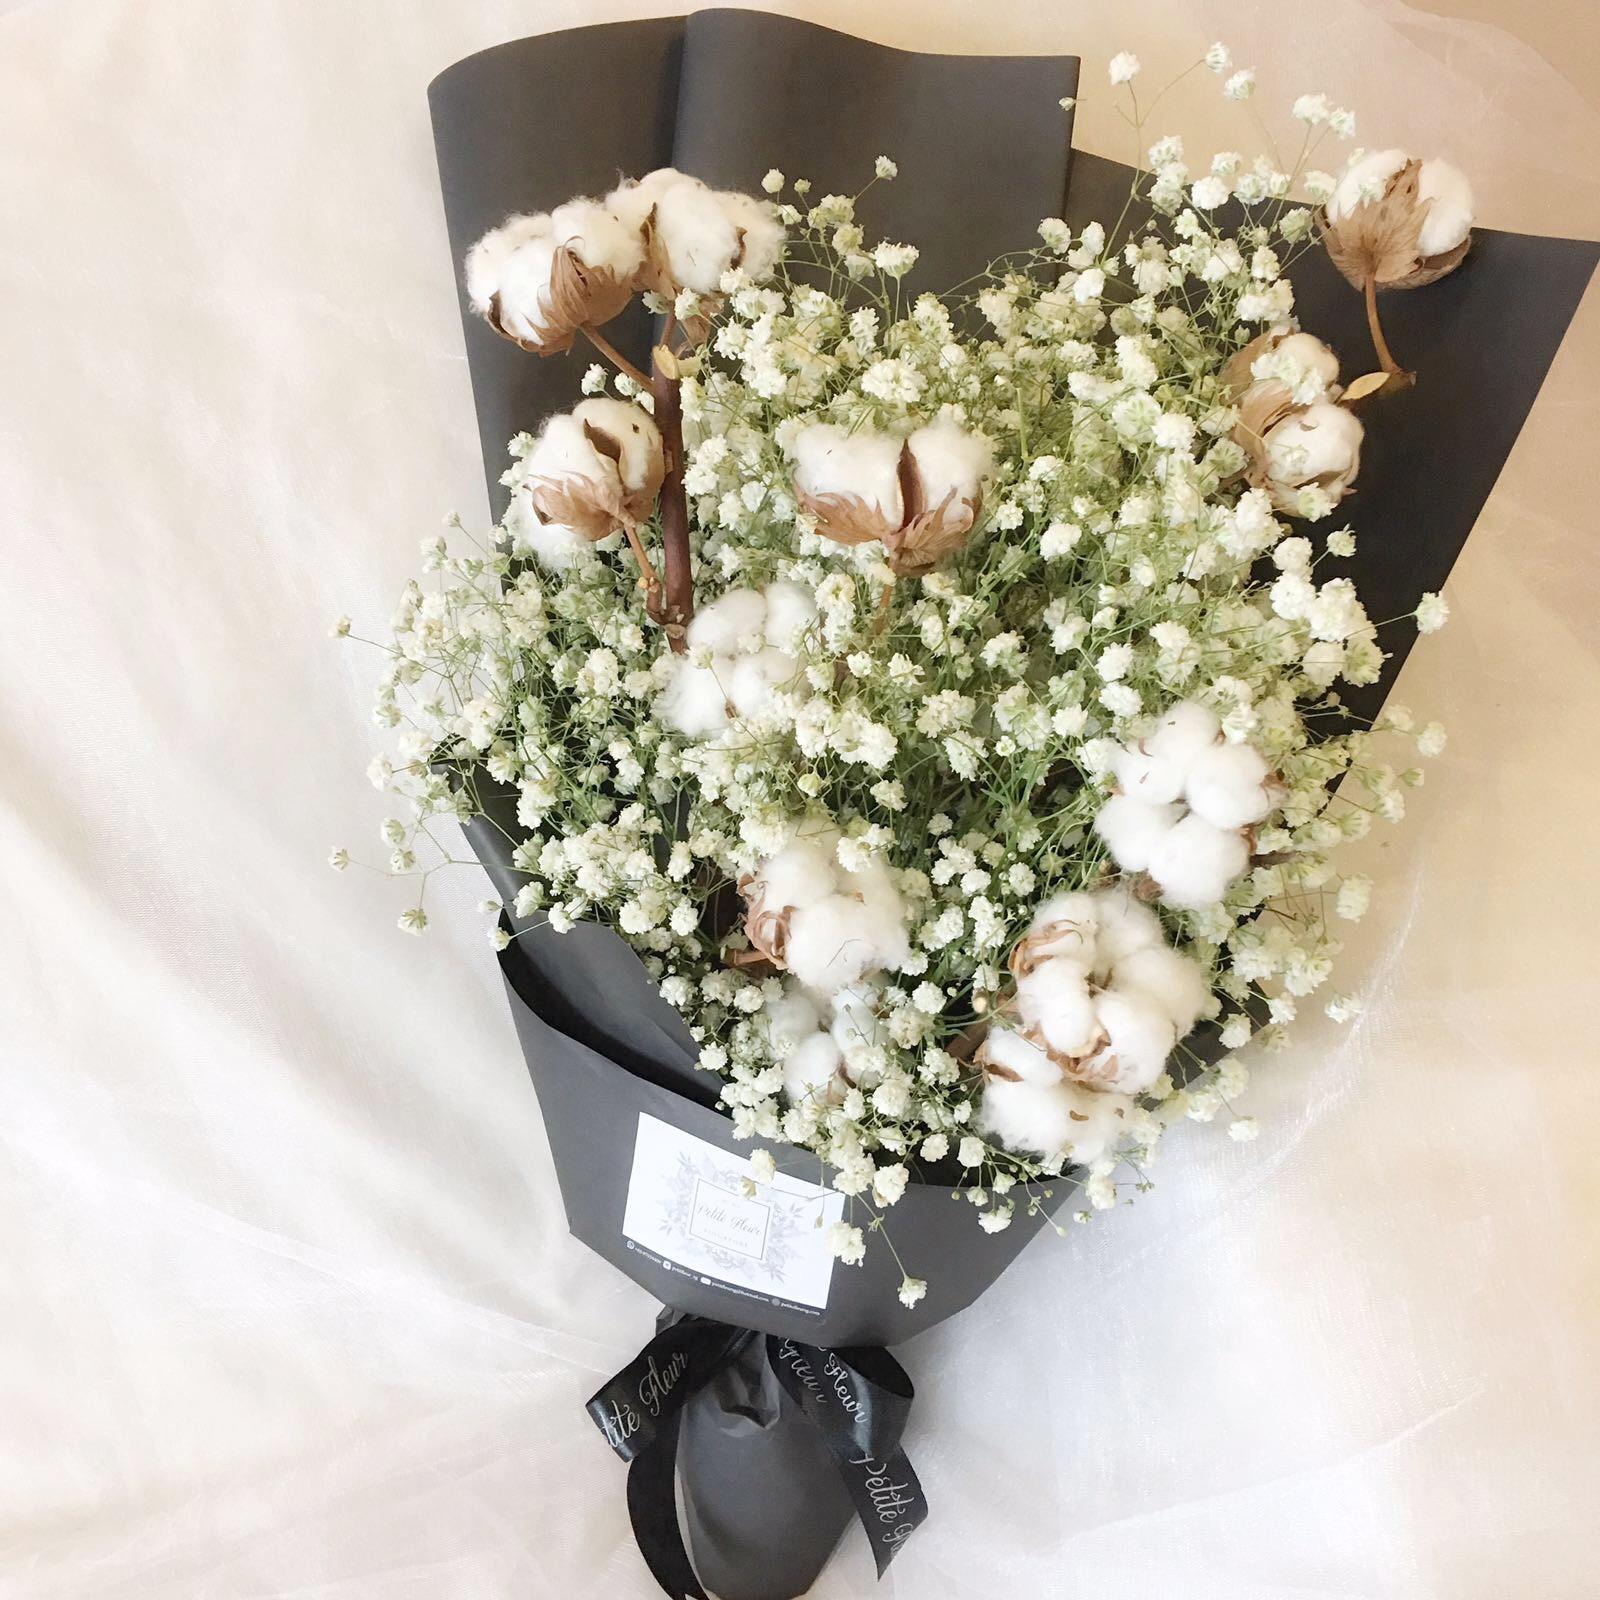 Cotton Flower Bouquet Choice Image - Flower Wallpaper HD